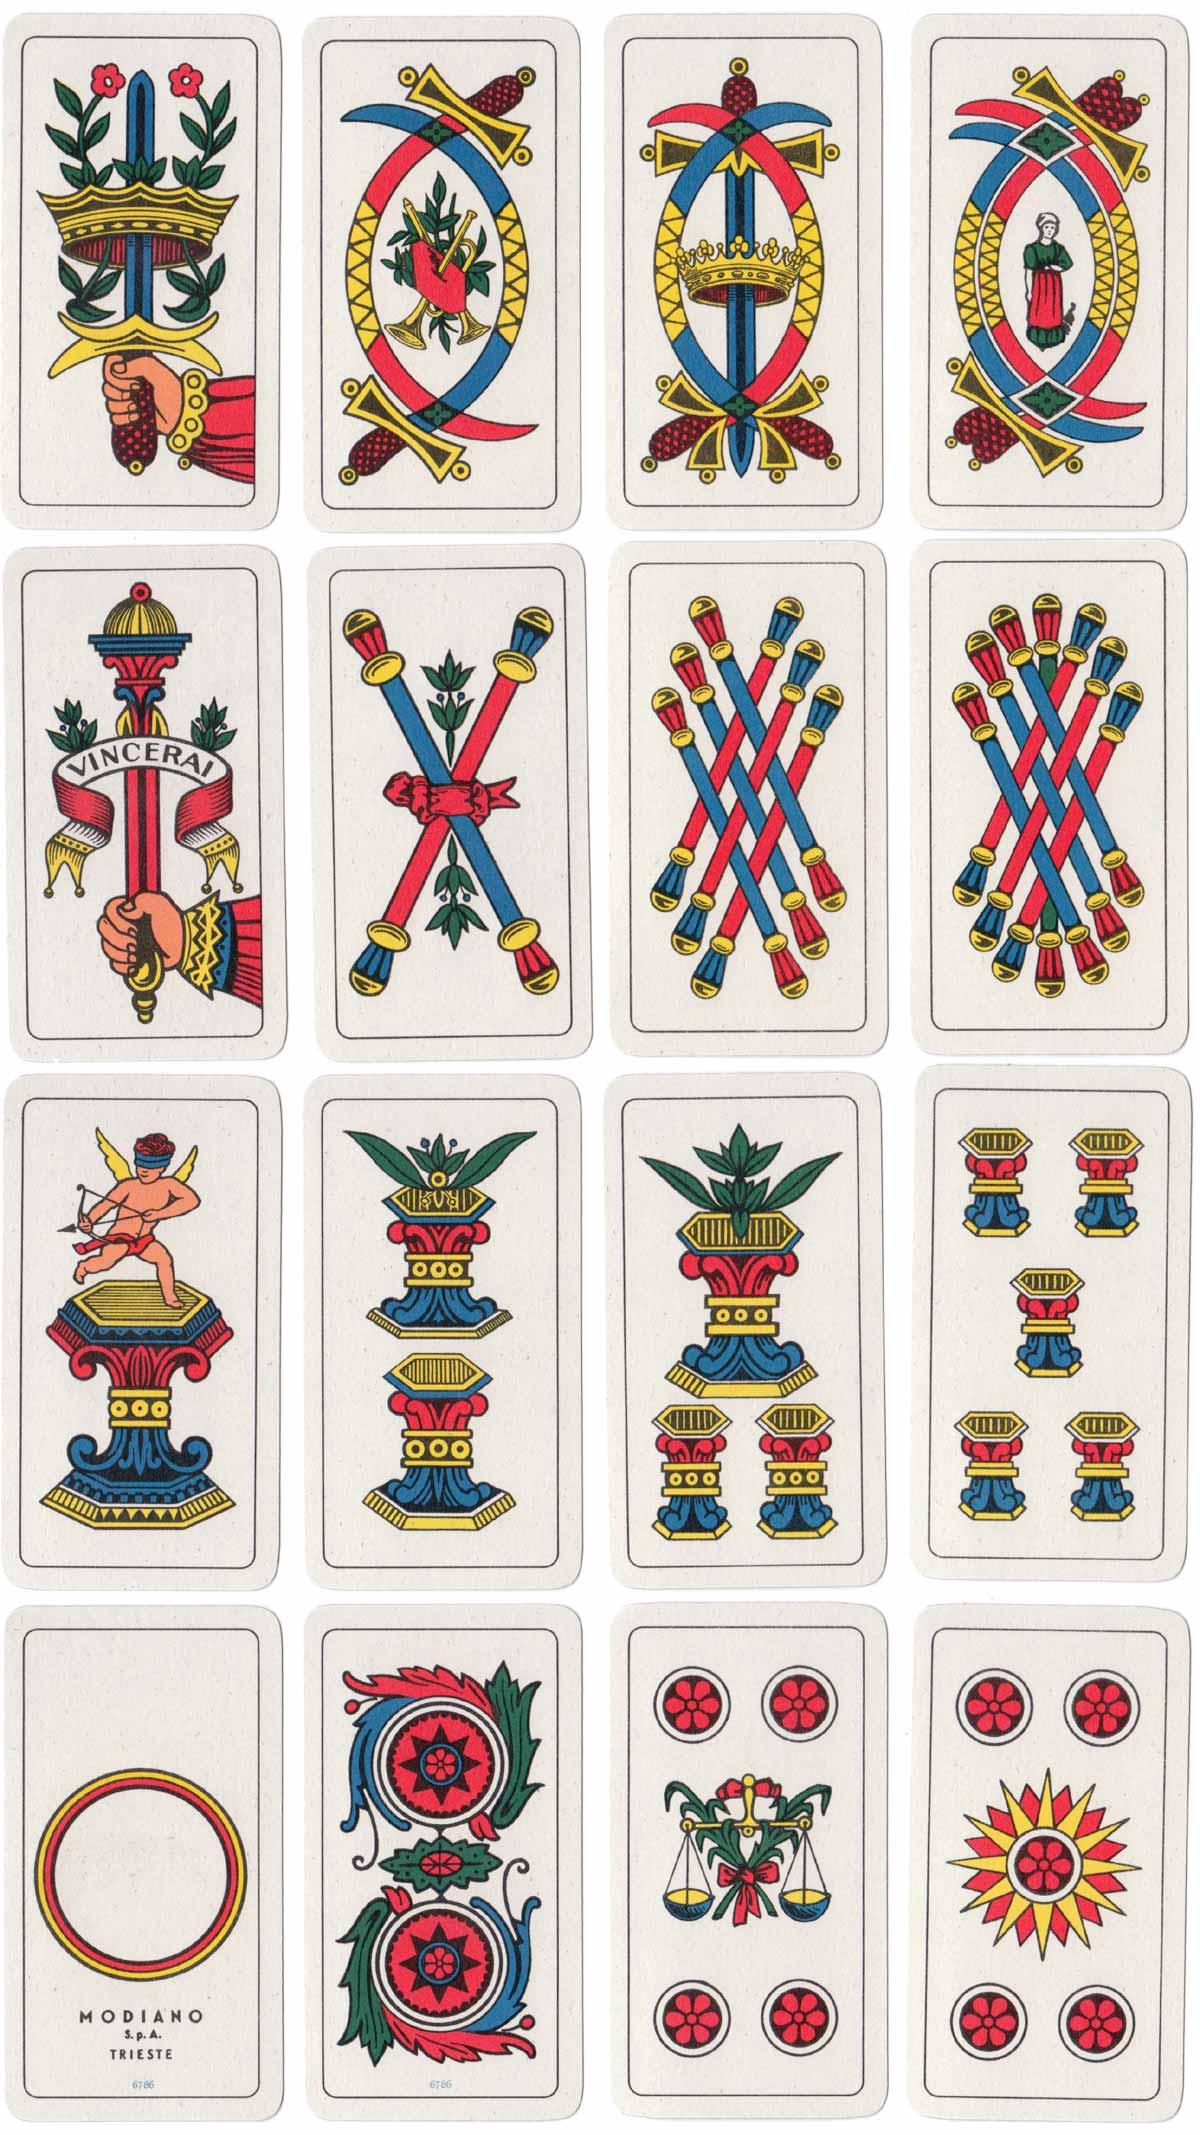 Bergamasche pattern by Modiano, 1970s